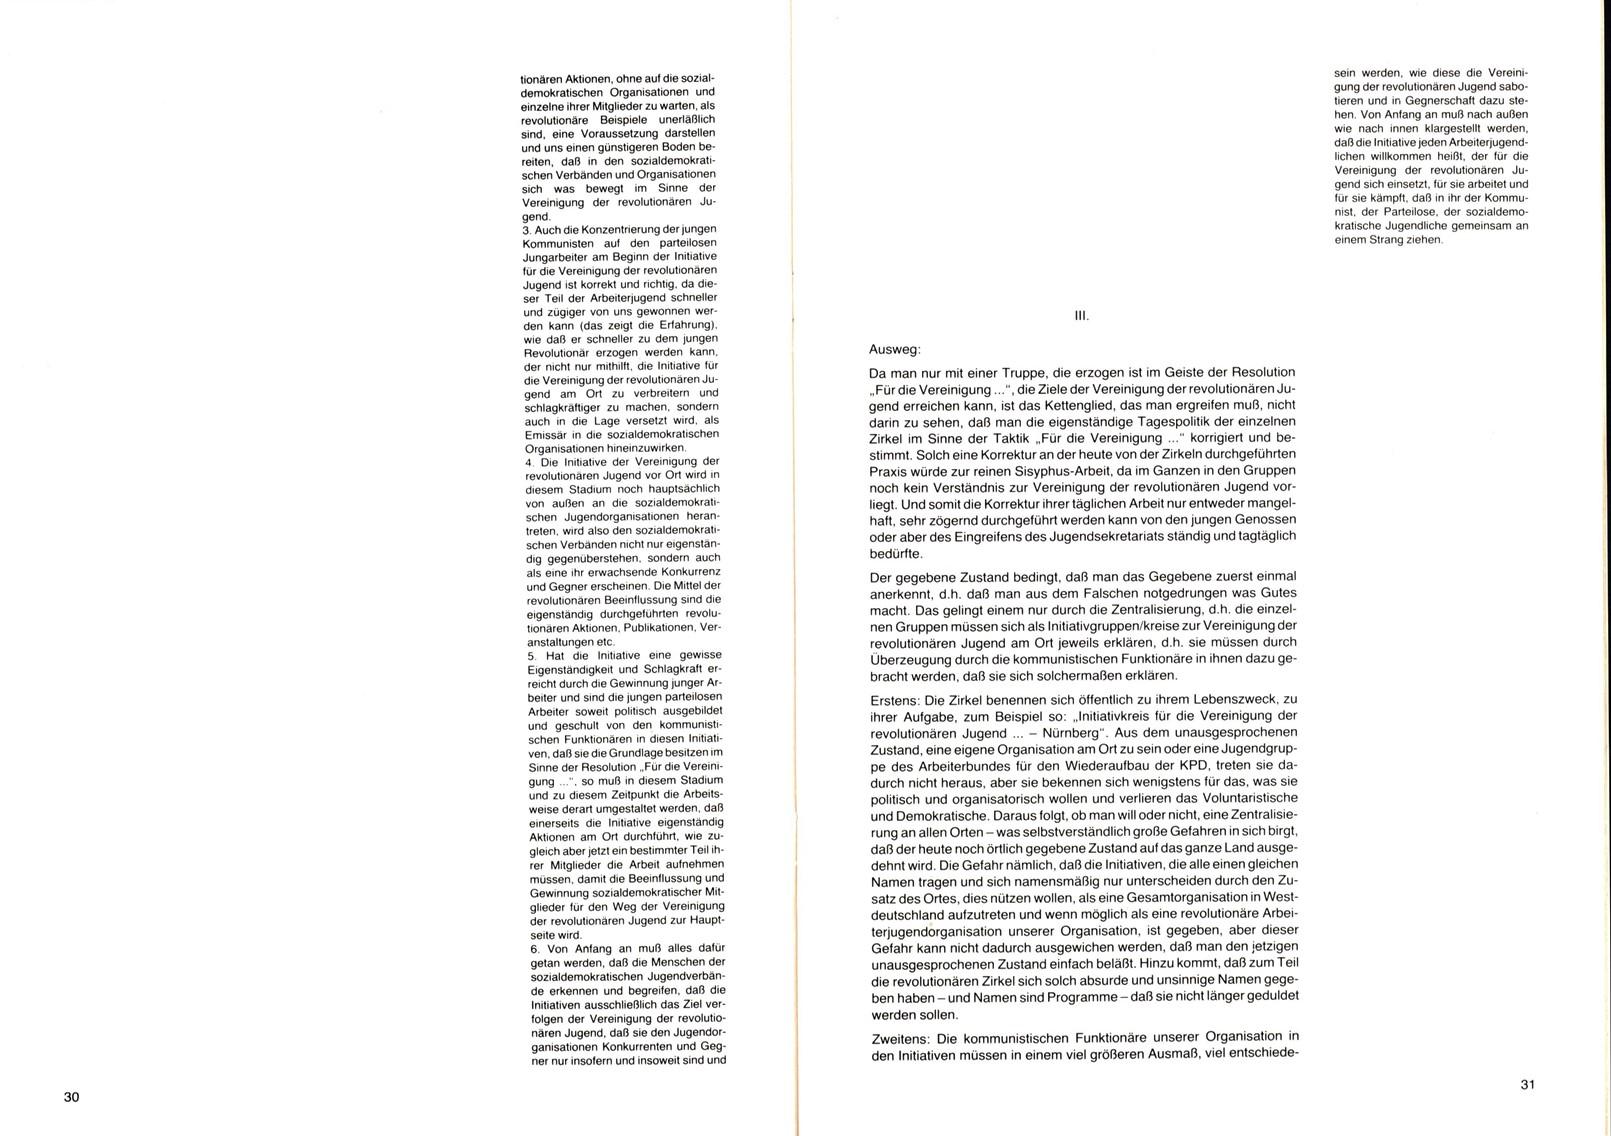 ABG_1985_Beschluesse_IV_Delegiertenkonferenz_17